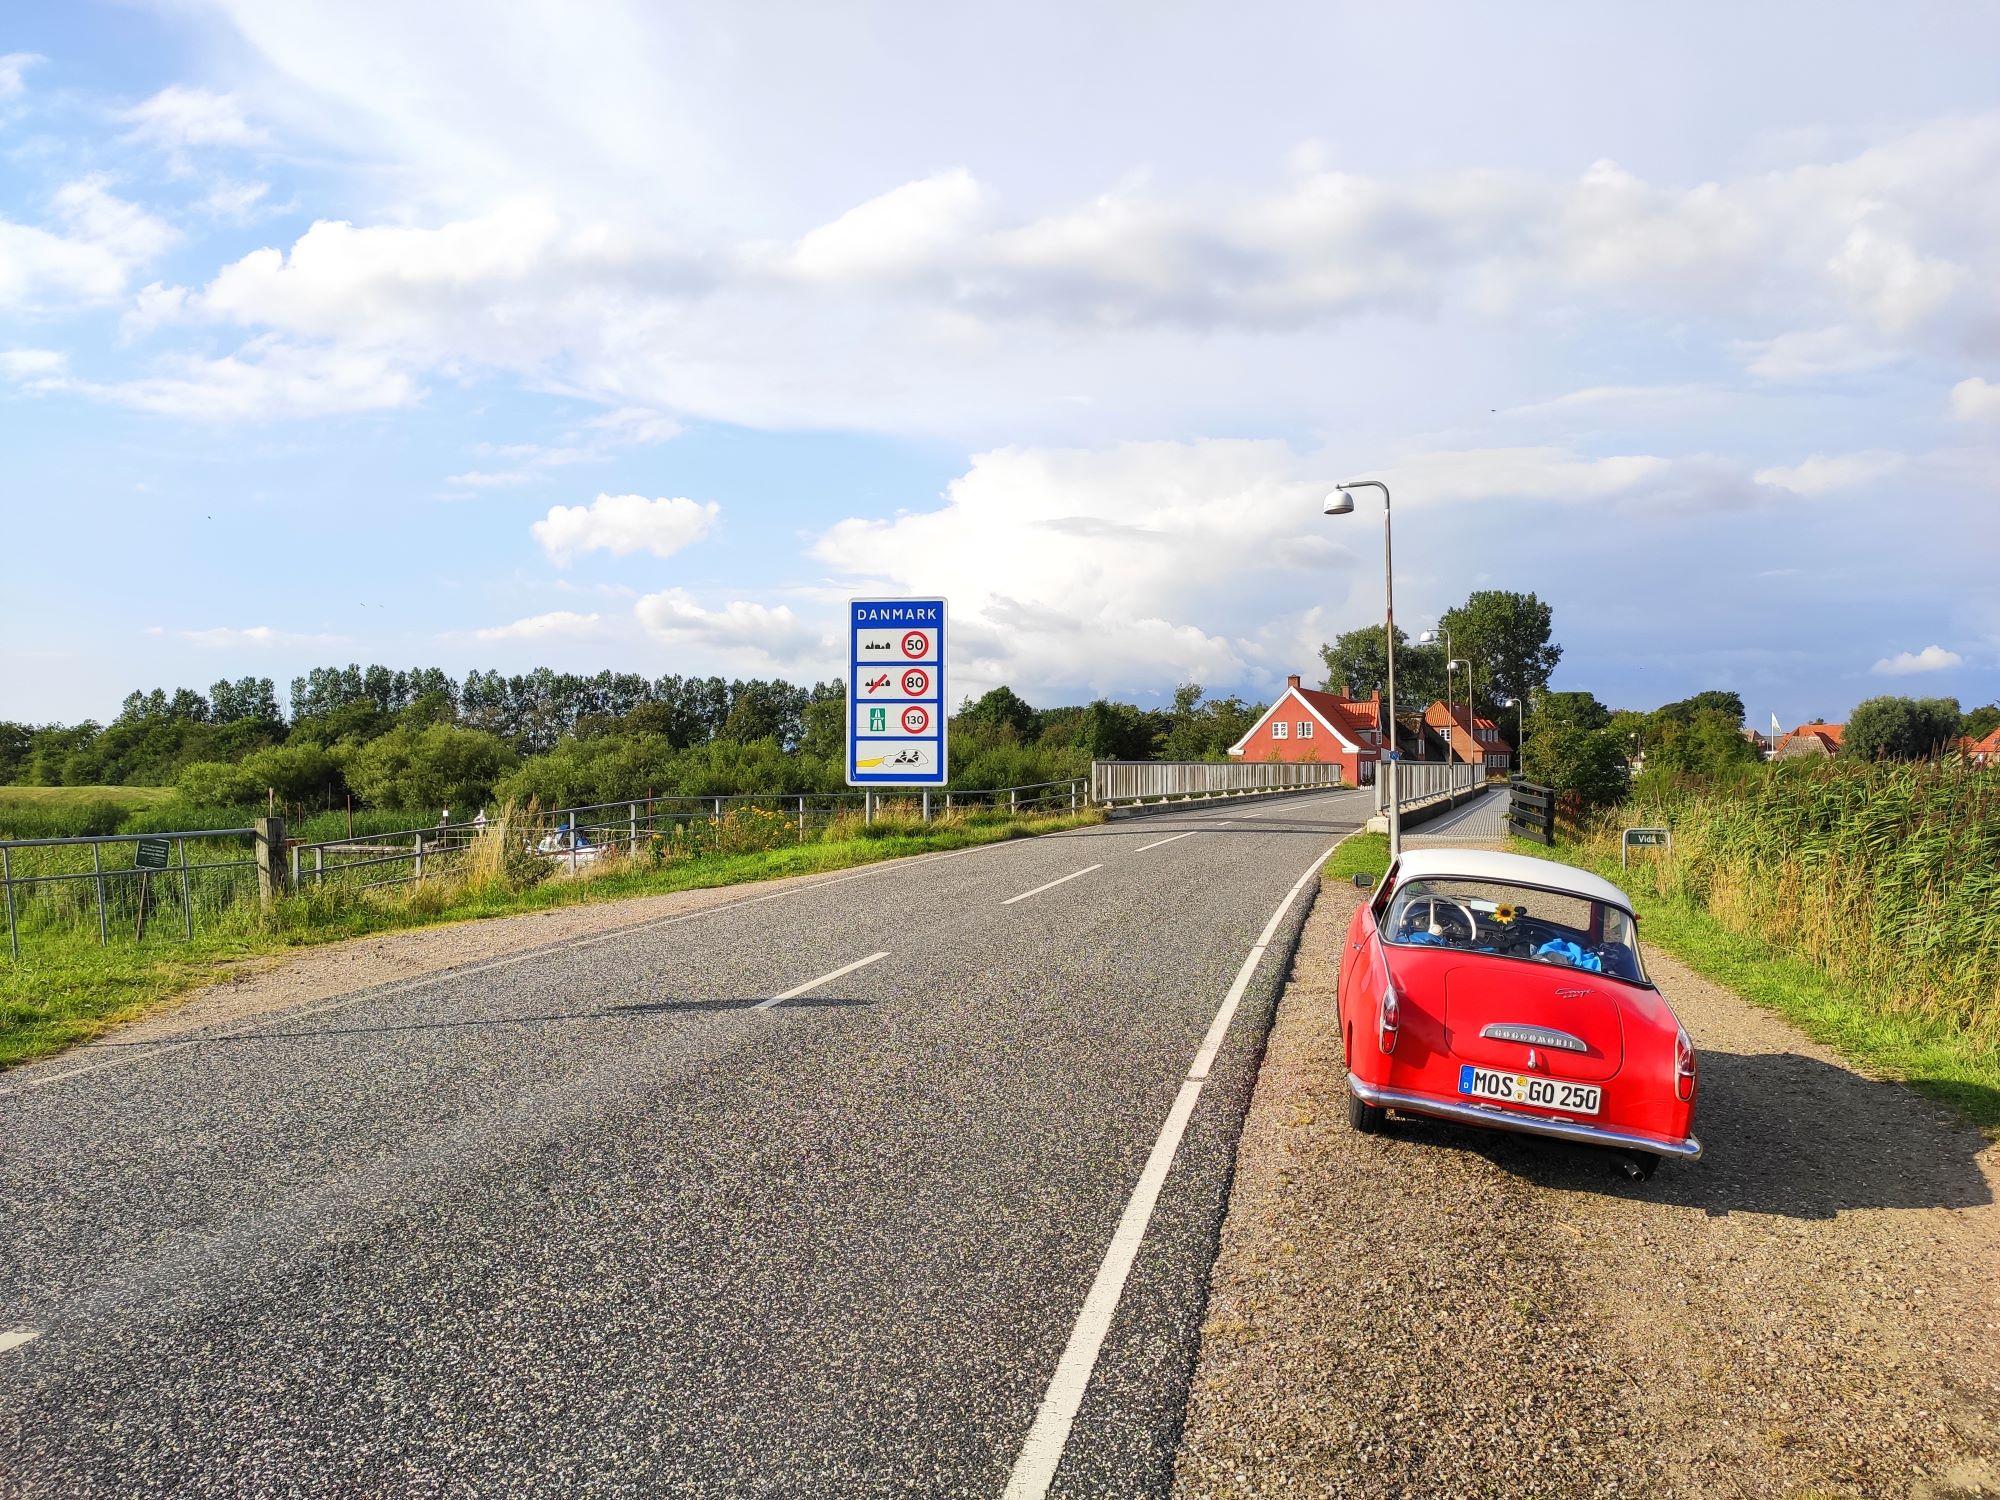 Goggo-Touren: Dänemark. Im alten Goggo Coupé der Nordseeküste entlang